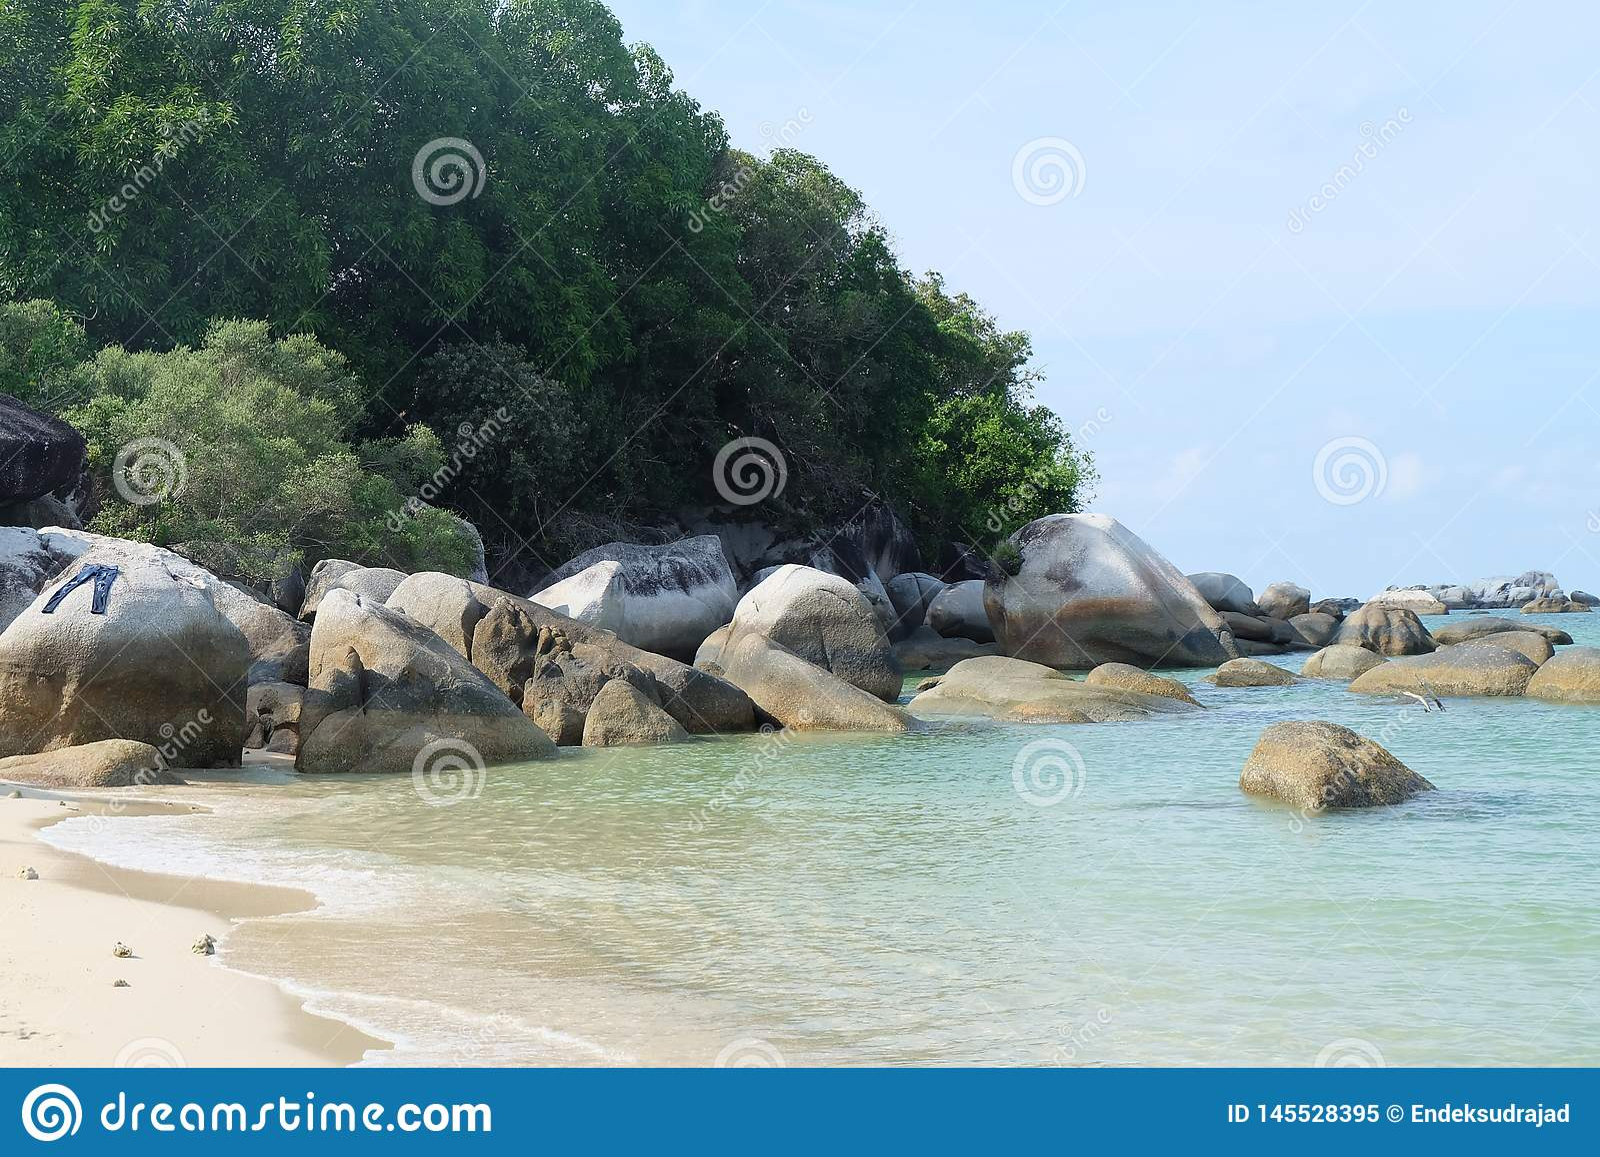 Wonder land island with beautiful beach